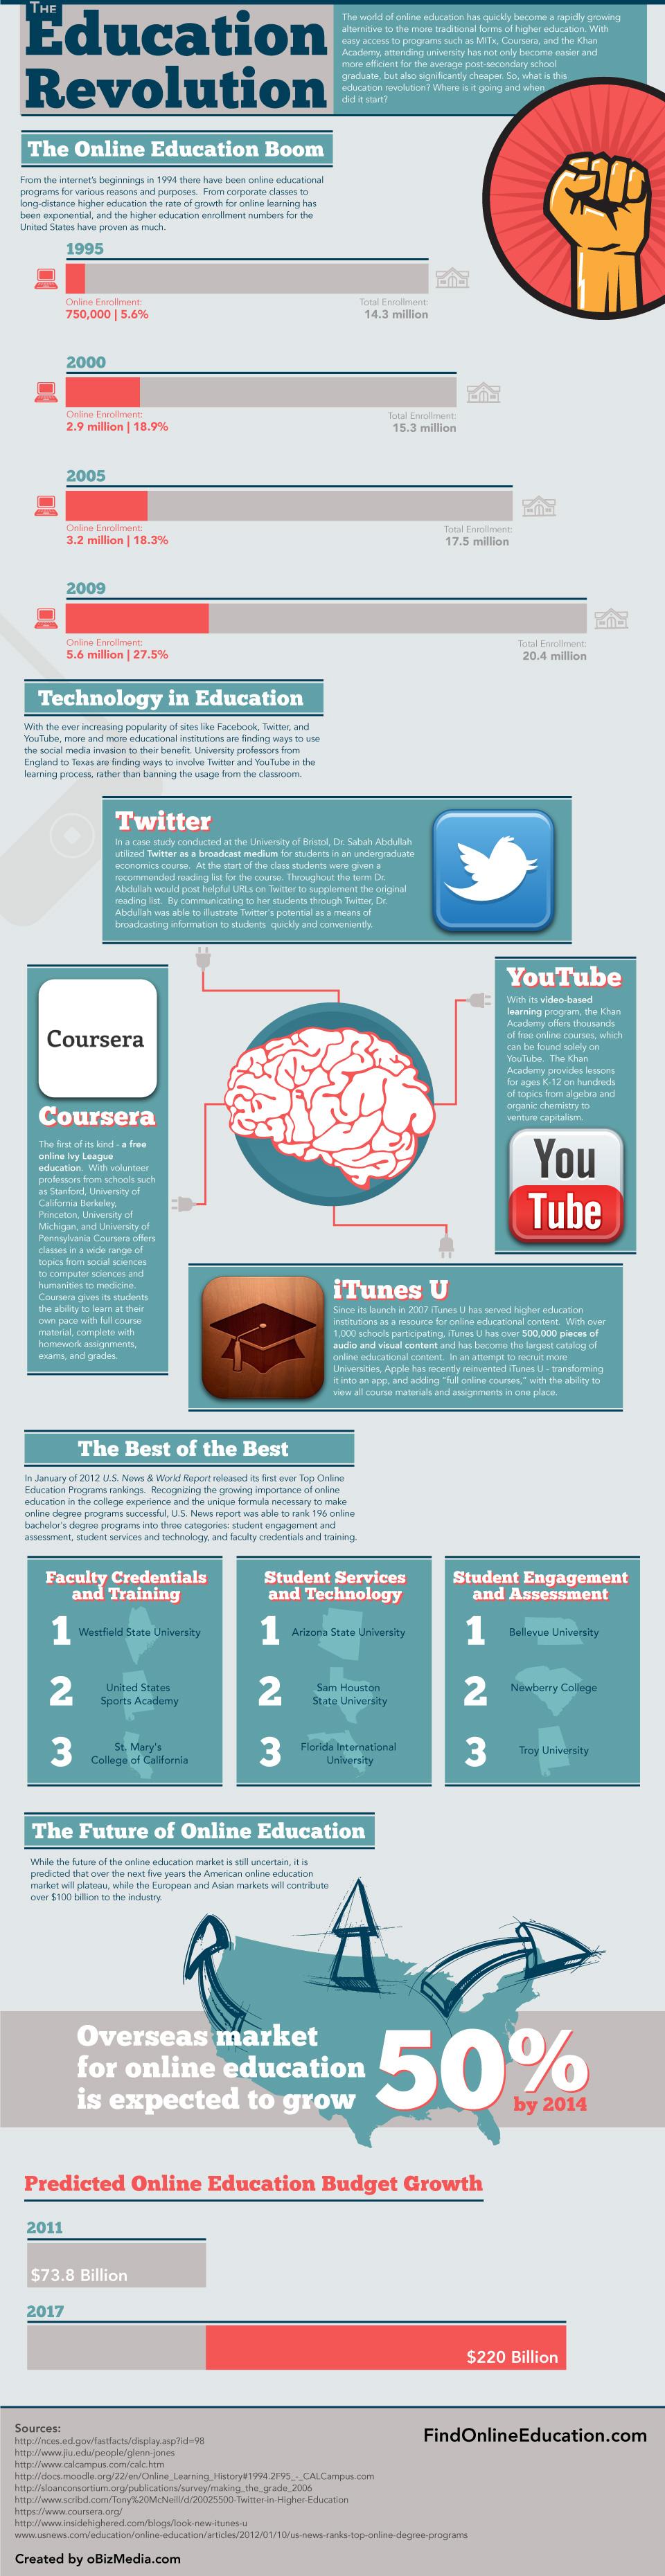 Online Education Revolution-infographic